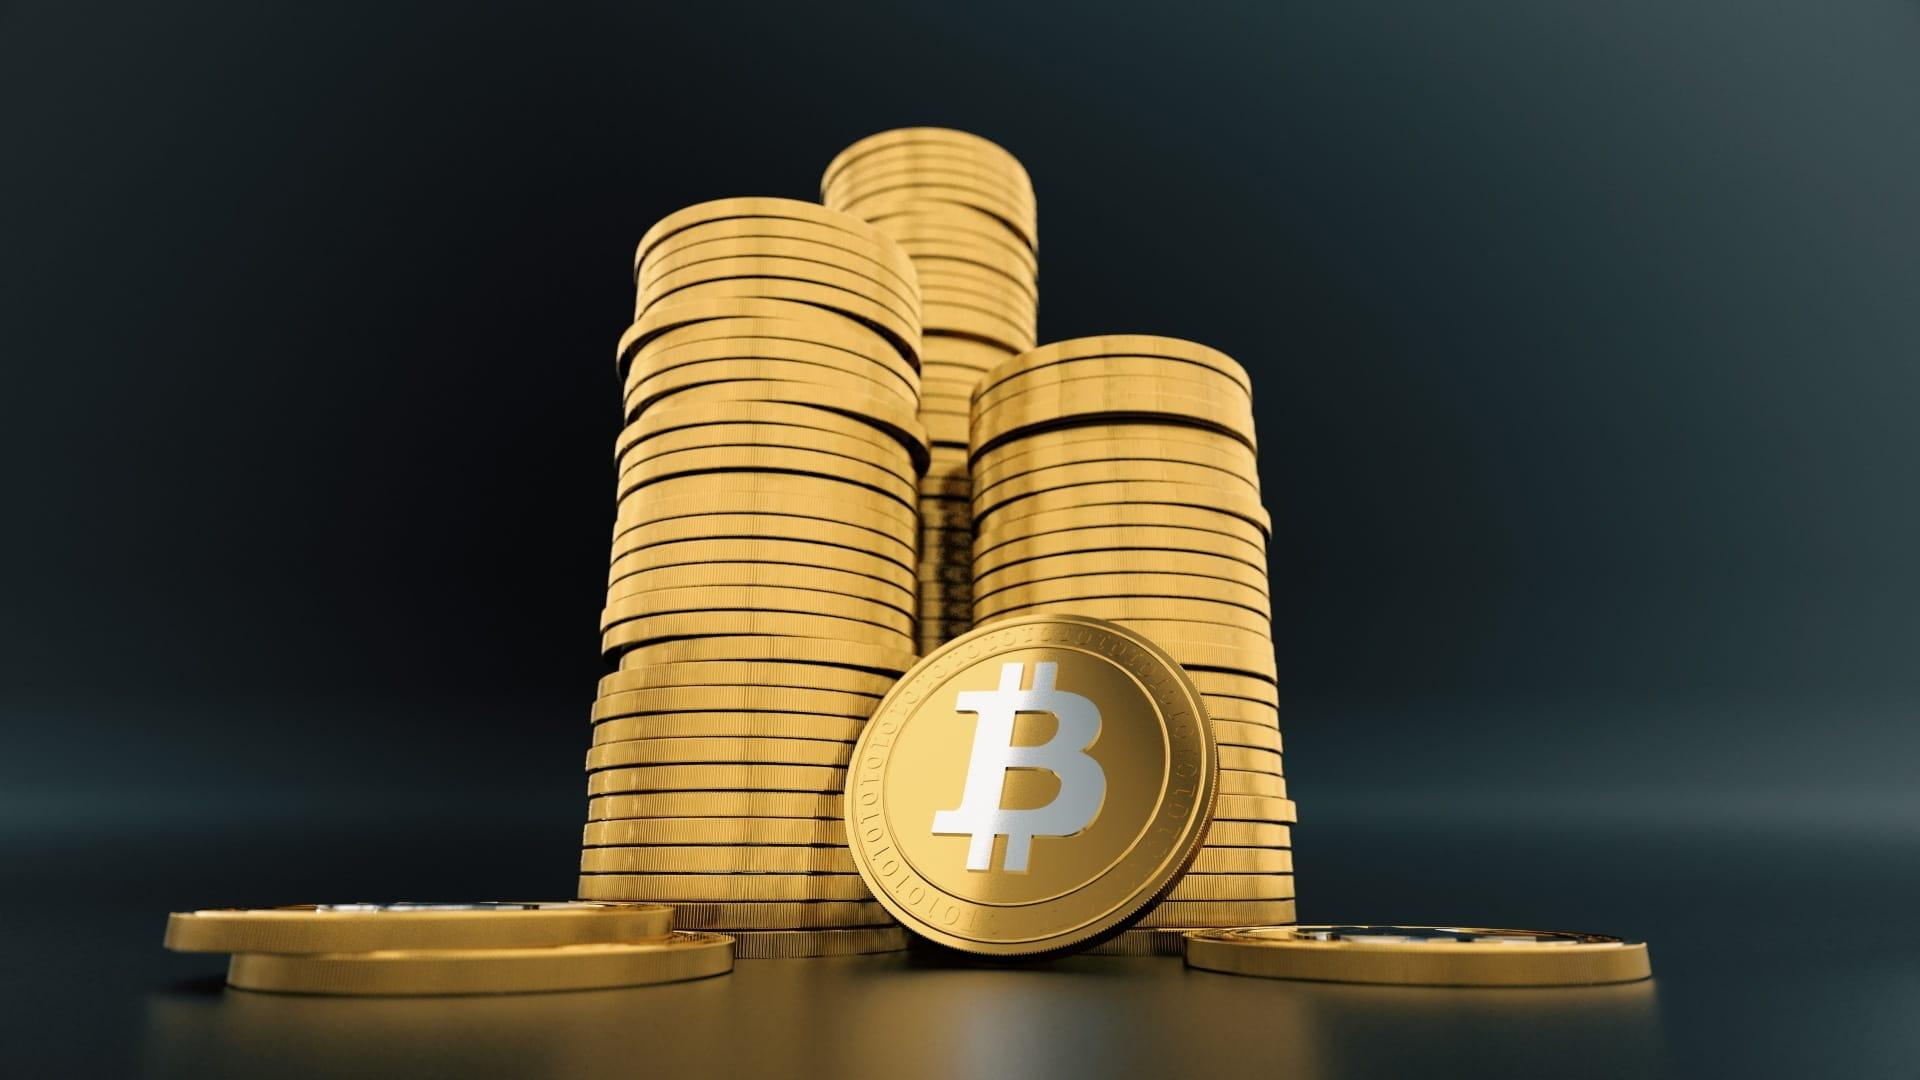 jocuri de noroc bitcoin)